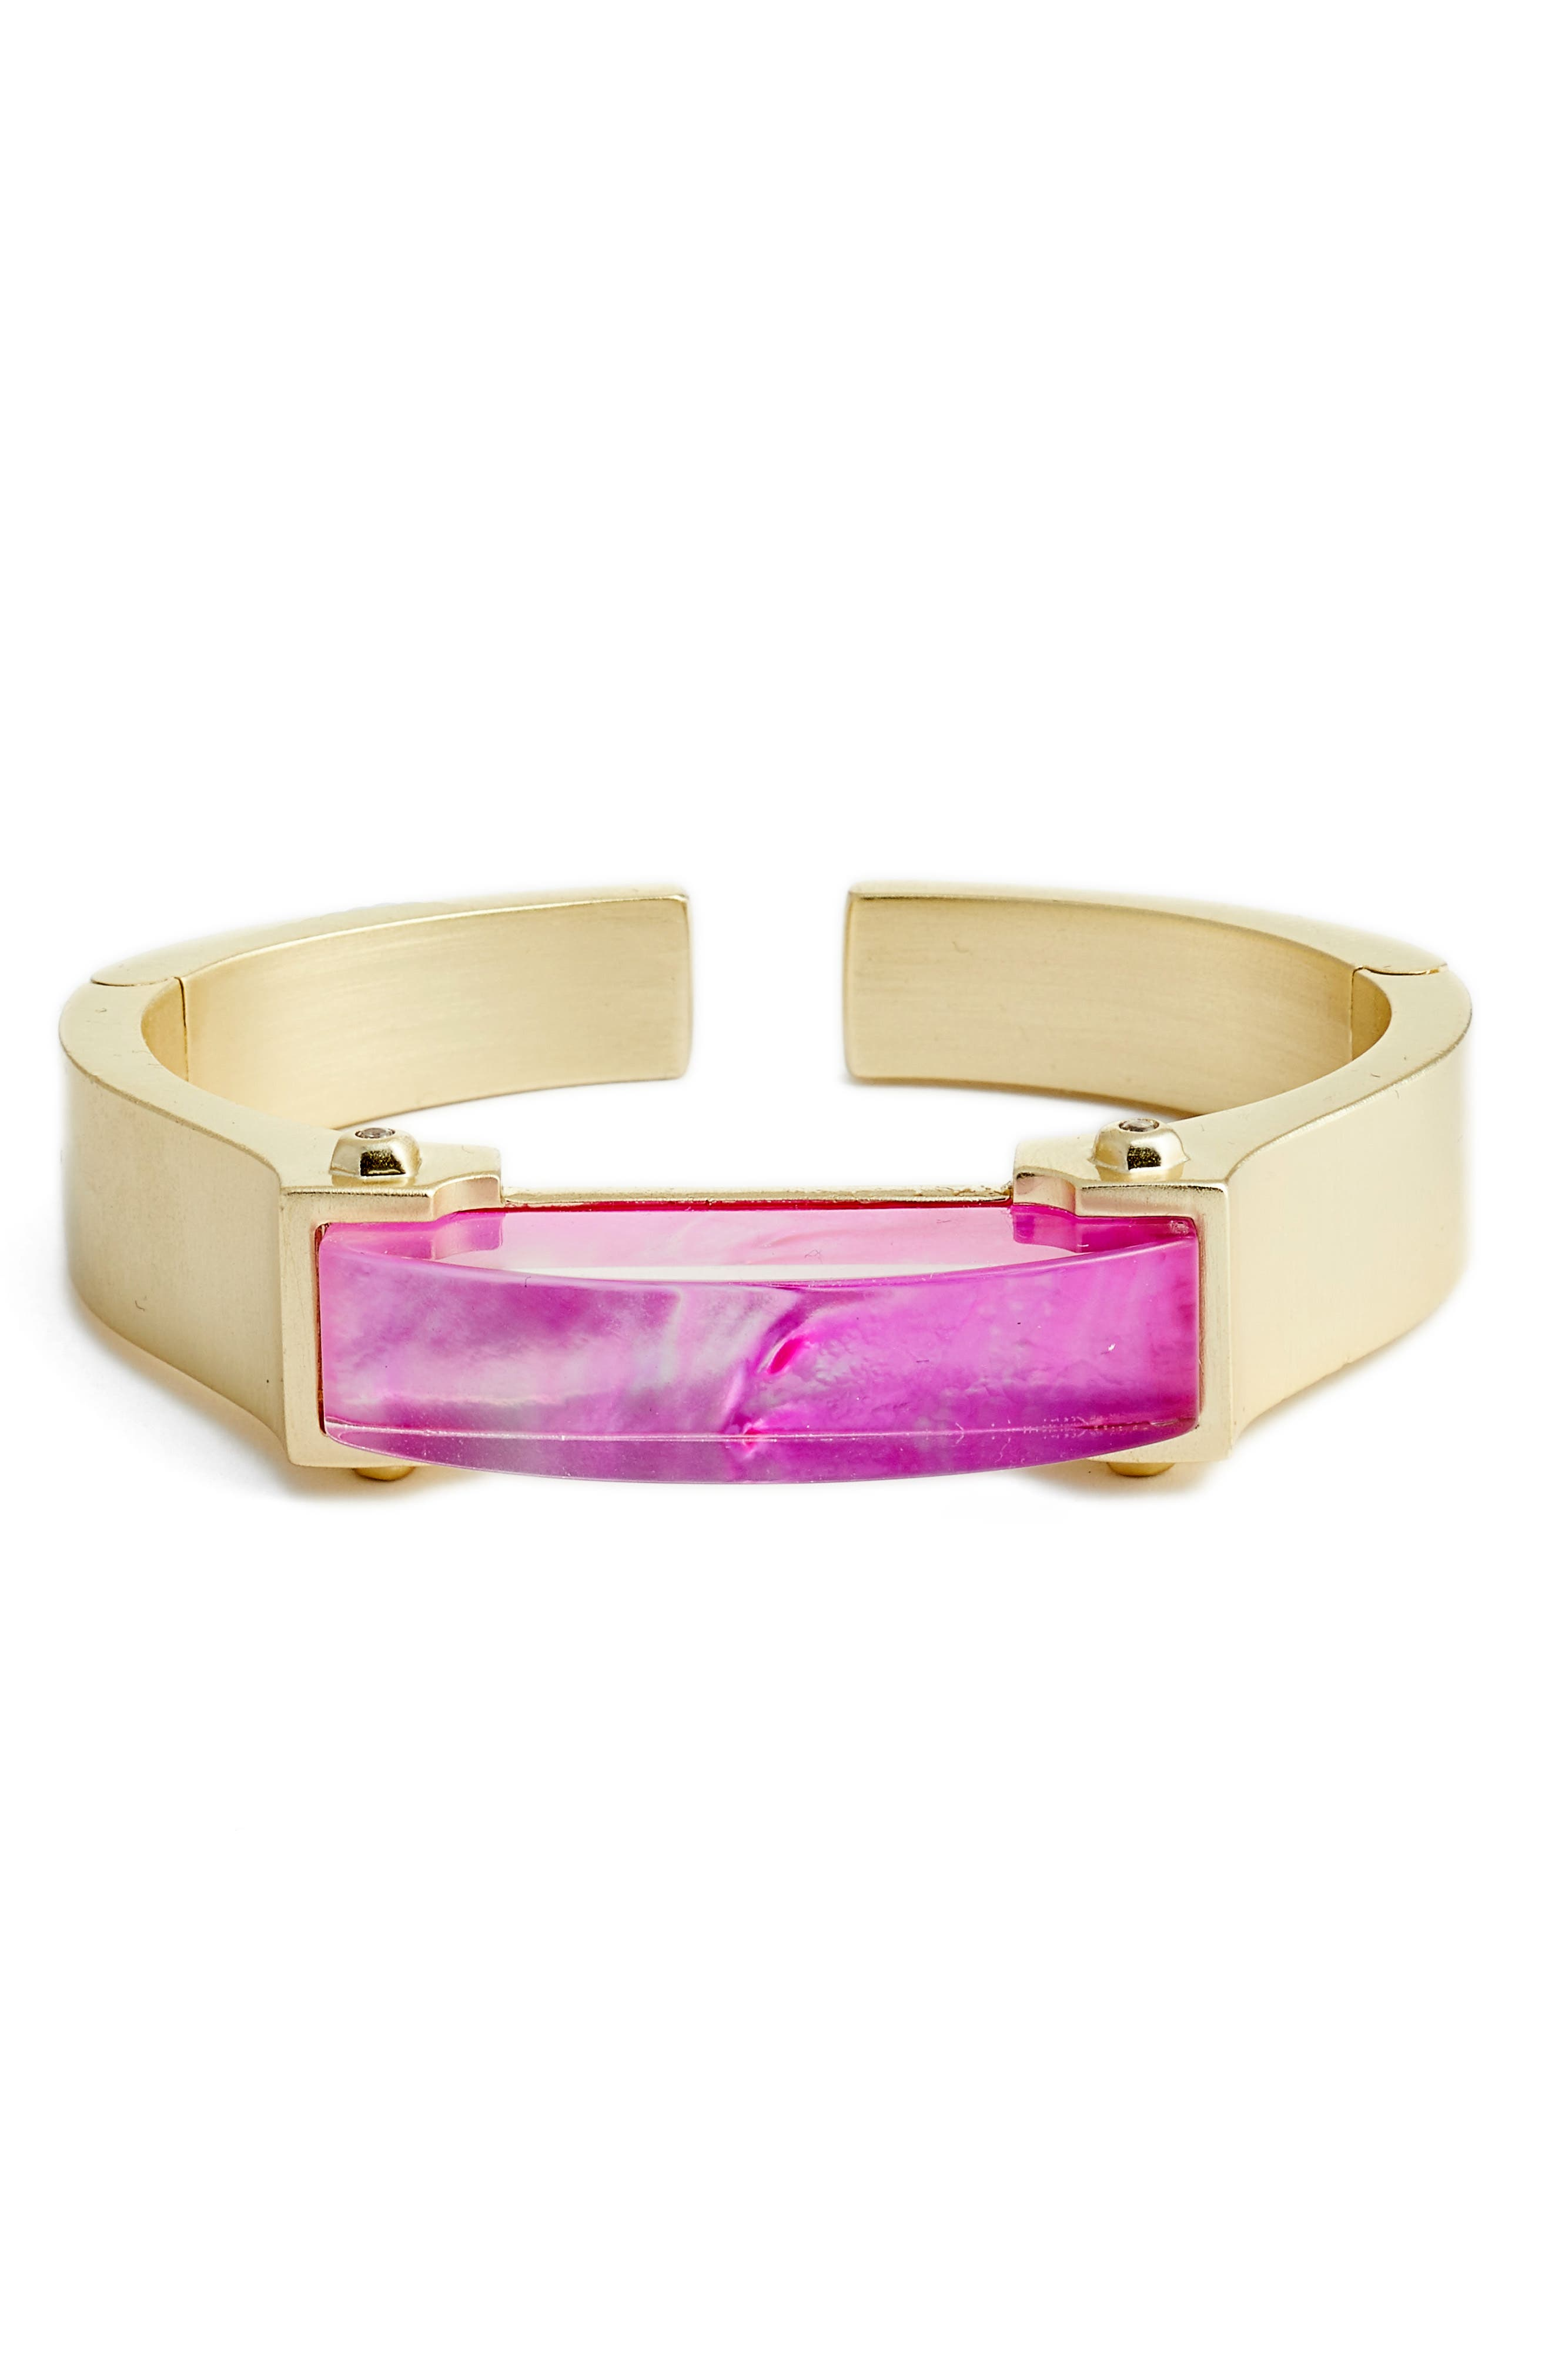 Kailey Cuff Bracelet,                             Main thumbnail 1, color,                             Magenta Mop/ Gold